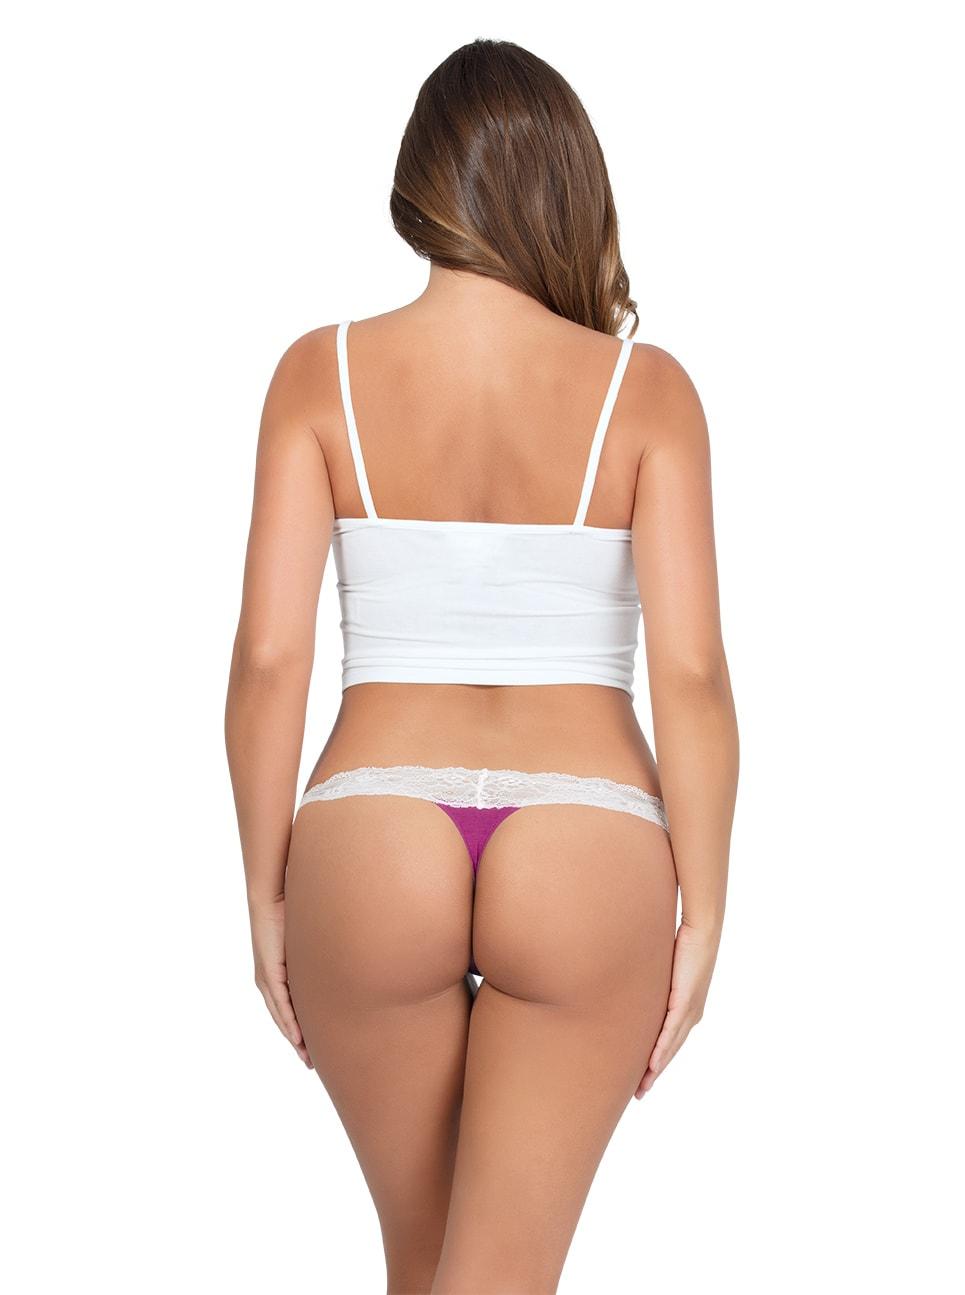 PARFAIT ParfaitPanty SoEssential ThongPP403 WildPinkIvory Back copy - Parfait Panty So Essential Thong - Wild Pink - PP403